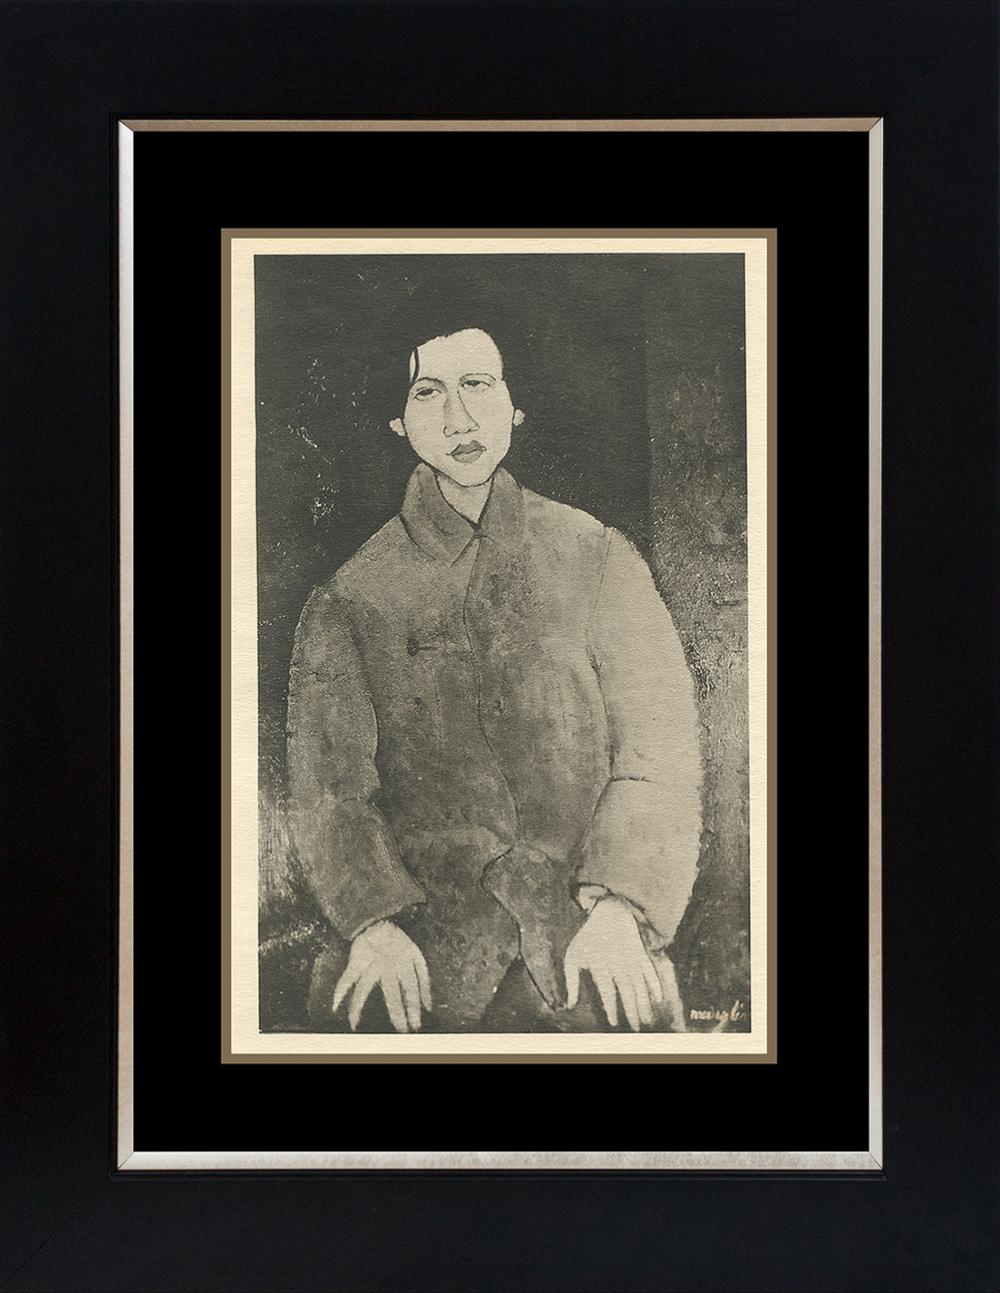 Lot 2809: Modigliani Lithograph from 1929